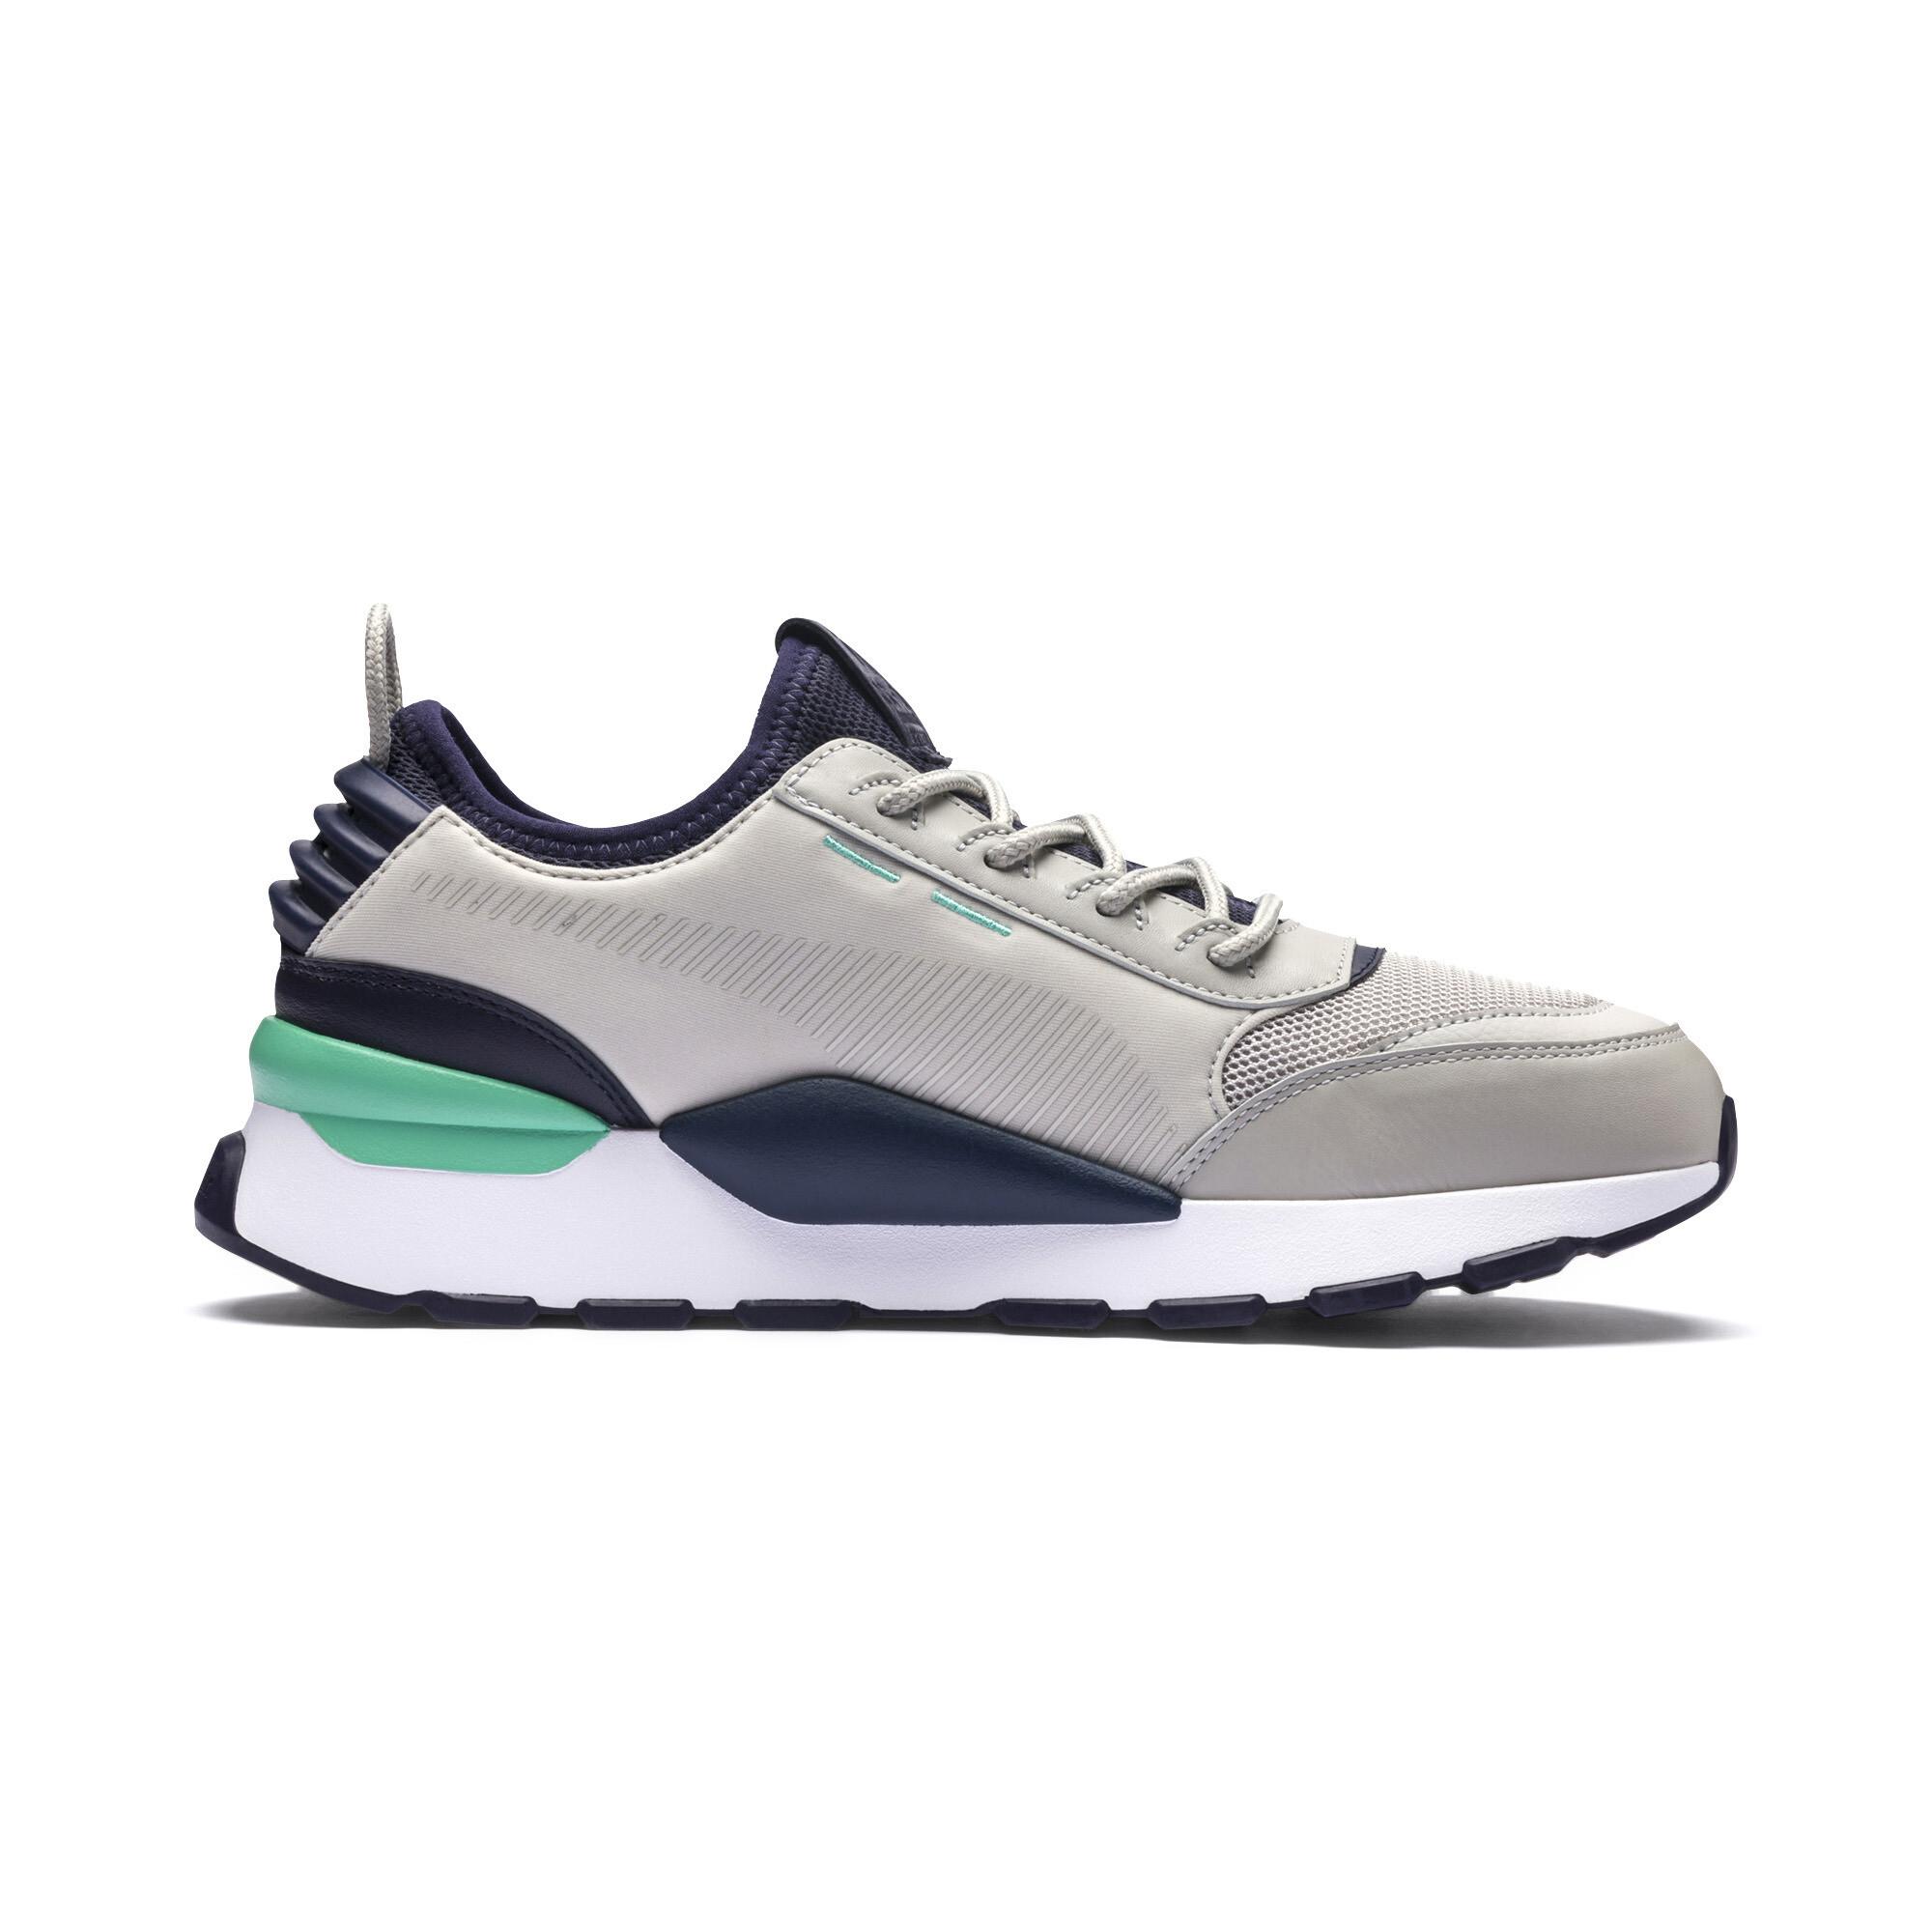 PUMA-RS-0-Tracks-Unisex-Shoe-Evolution thumbnail 7